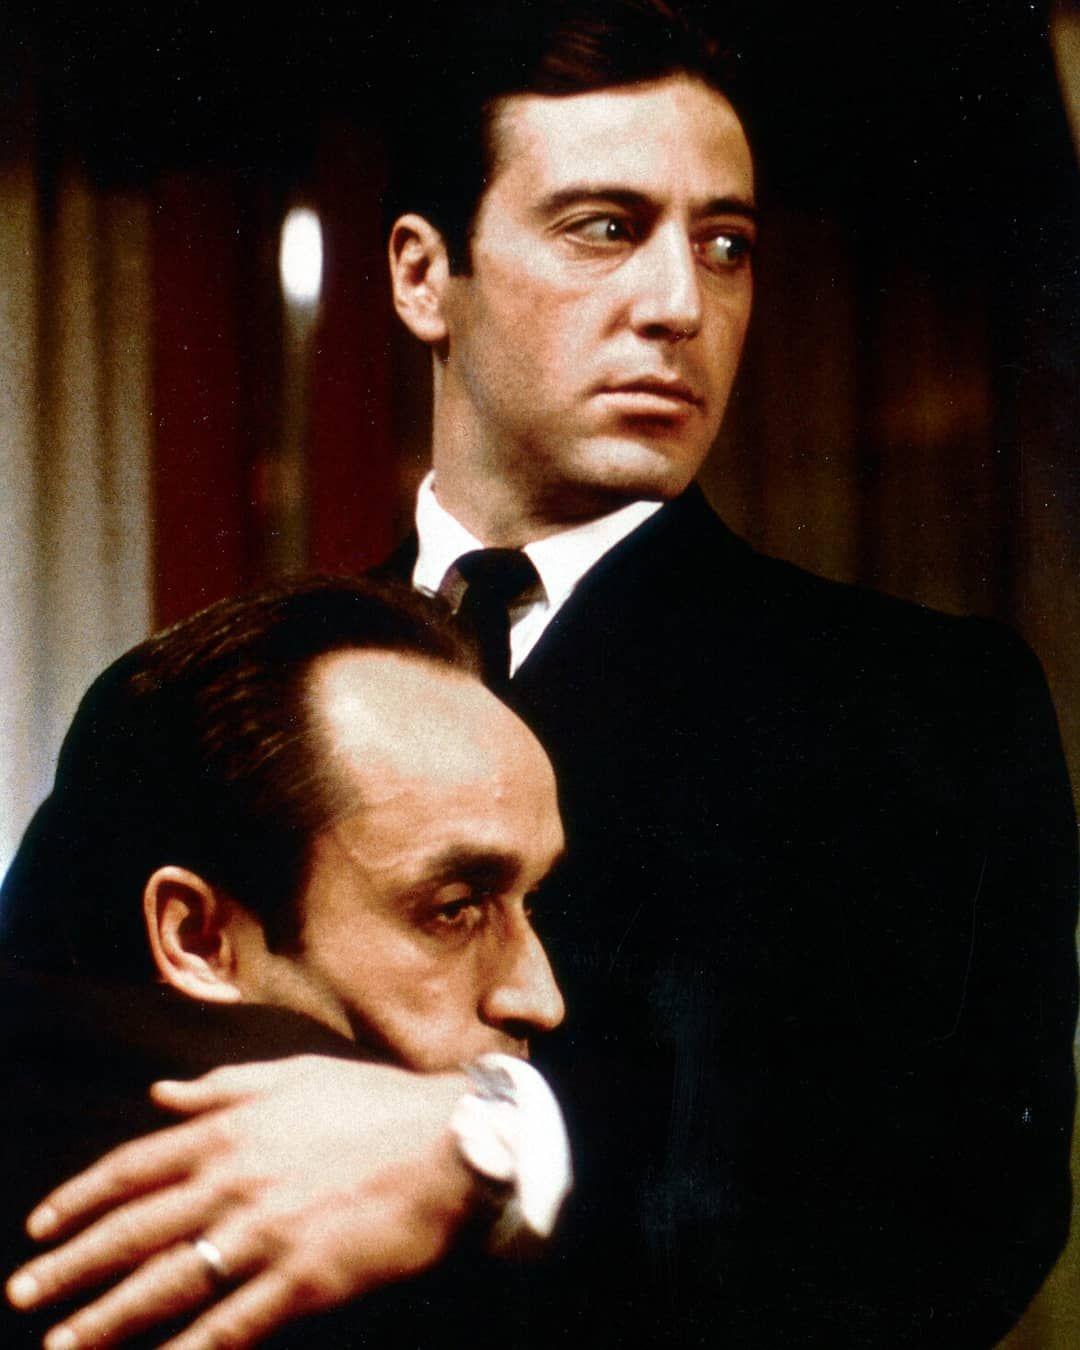 Fredo: Al Pacino As Michael Corleone & John Cazale As Fredo